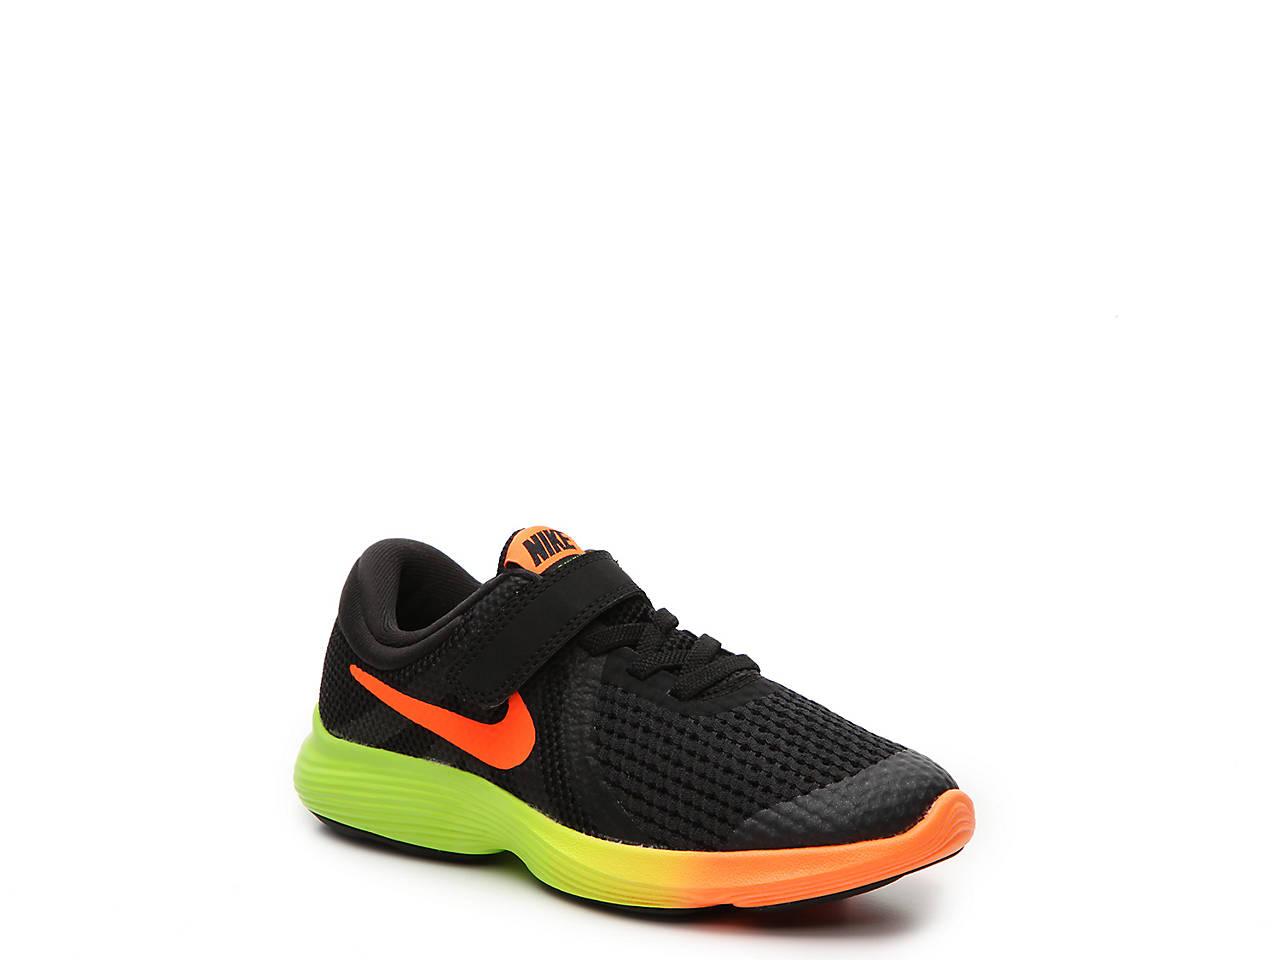 4fe6610c30 Nike Revolution 4 Toddler & Youth Running Shoe Kids Shoes   DSW